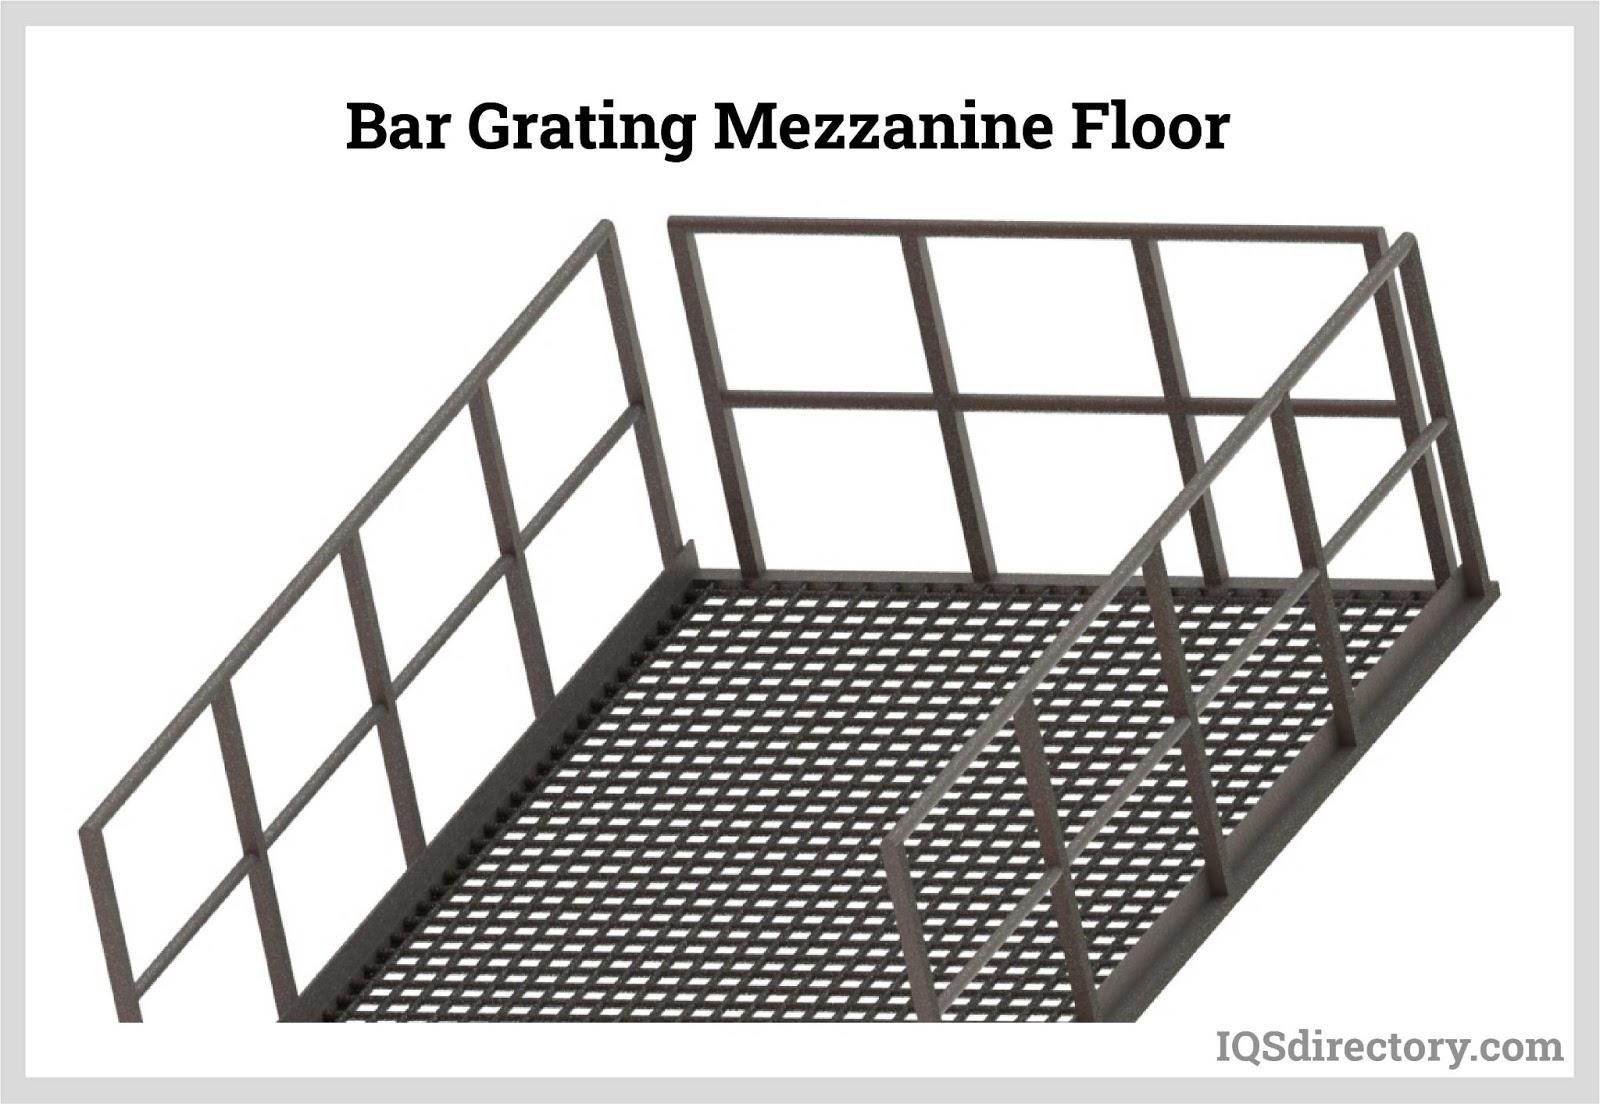 Bar Grating Mezzanine Floor